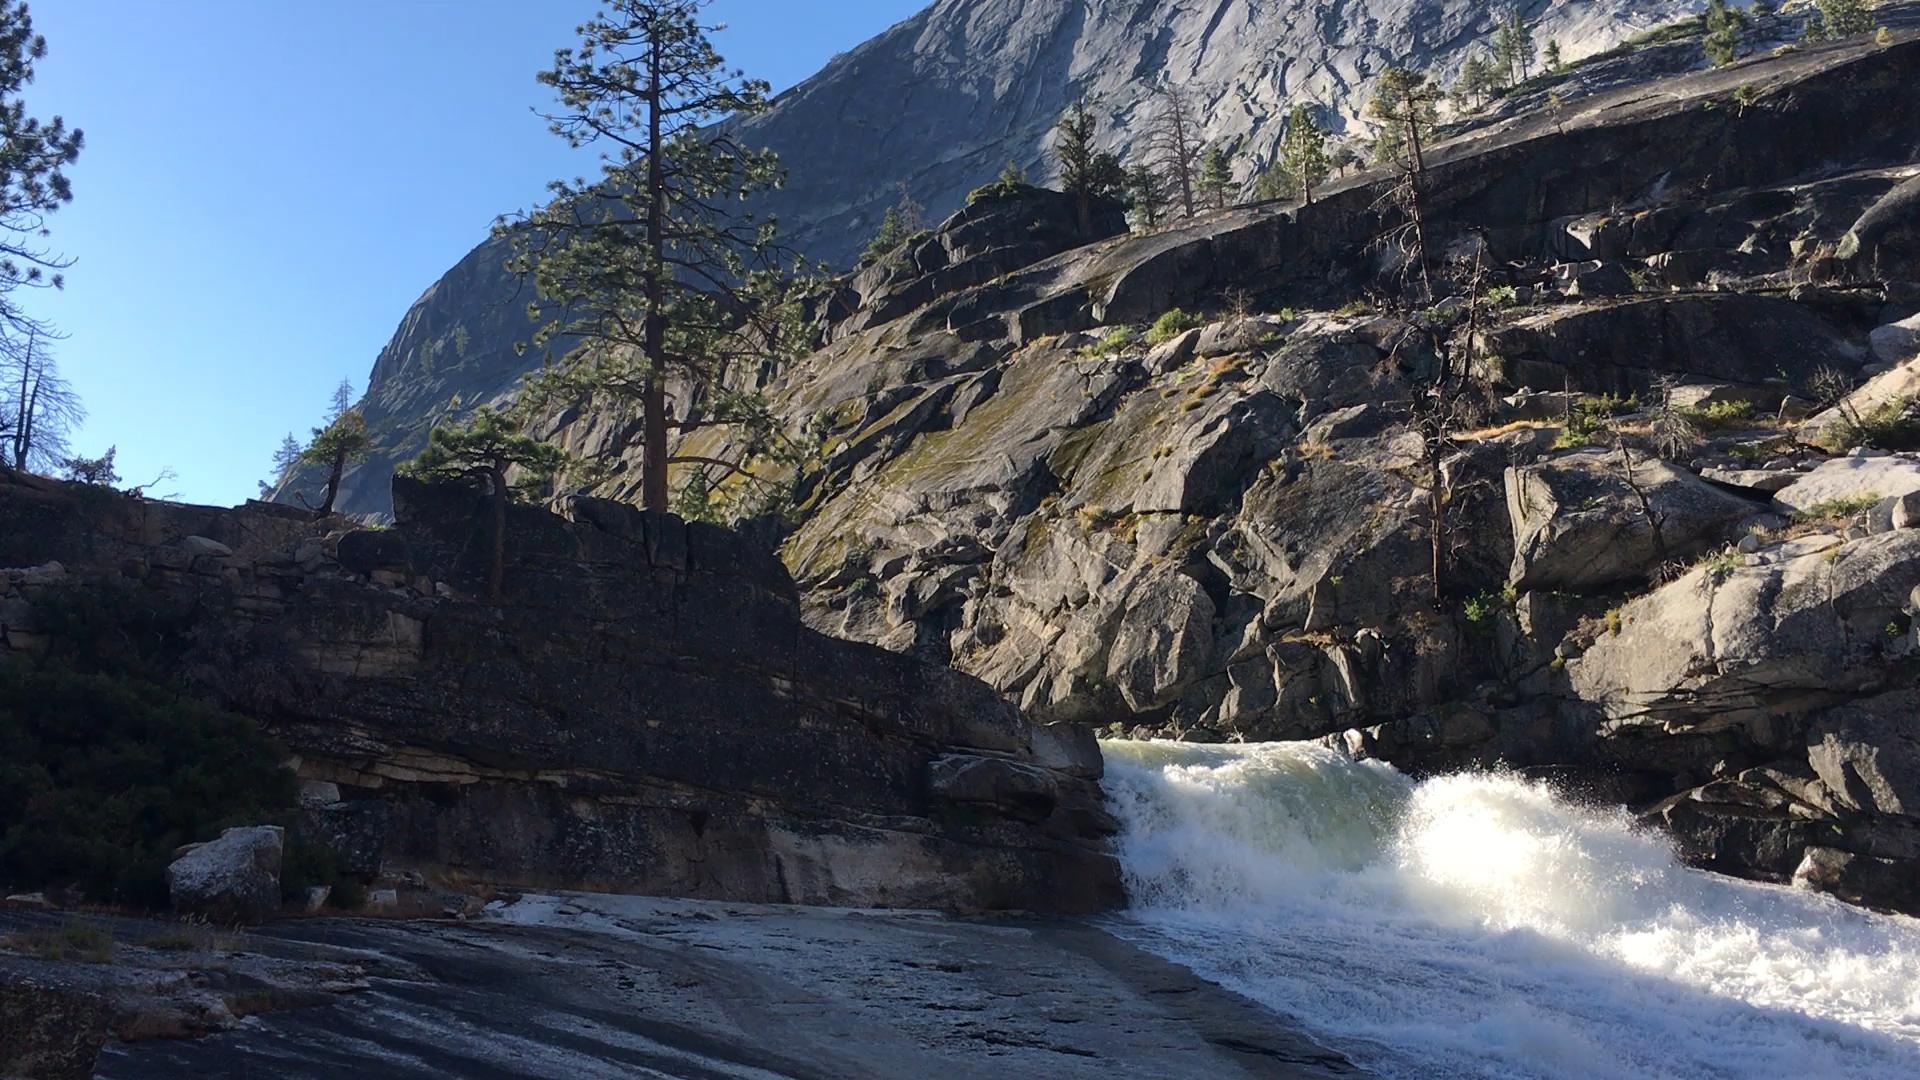 Fire & Ice in the High Sierra - Summer 2019